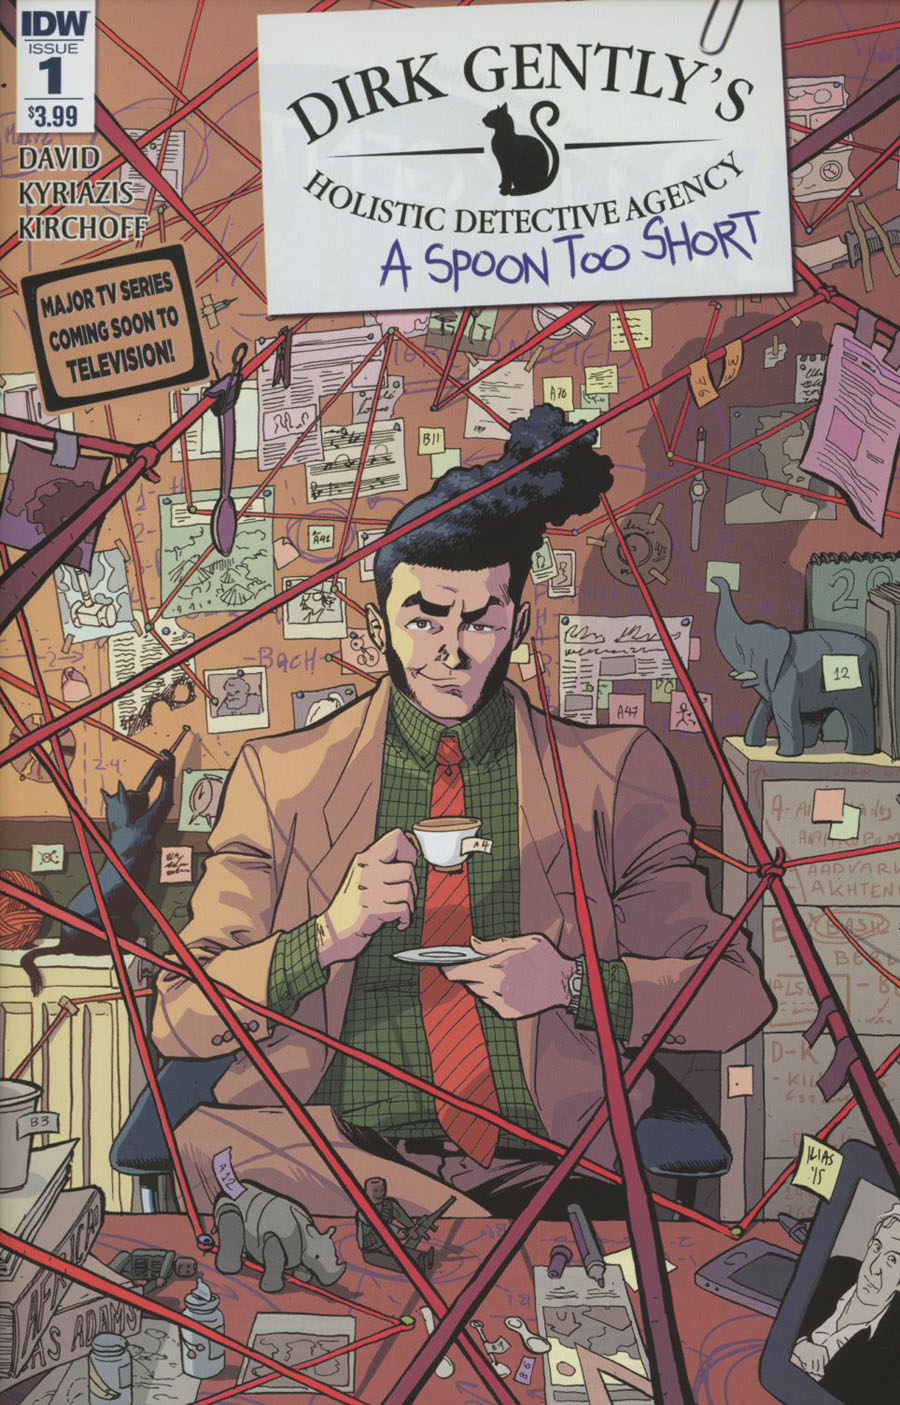 Dirk Gentlys Holistic Detective Agency A Spoon Too Short #1 Cover A Regular Ilias Kyriazis Cover